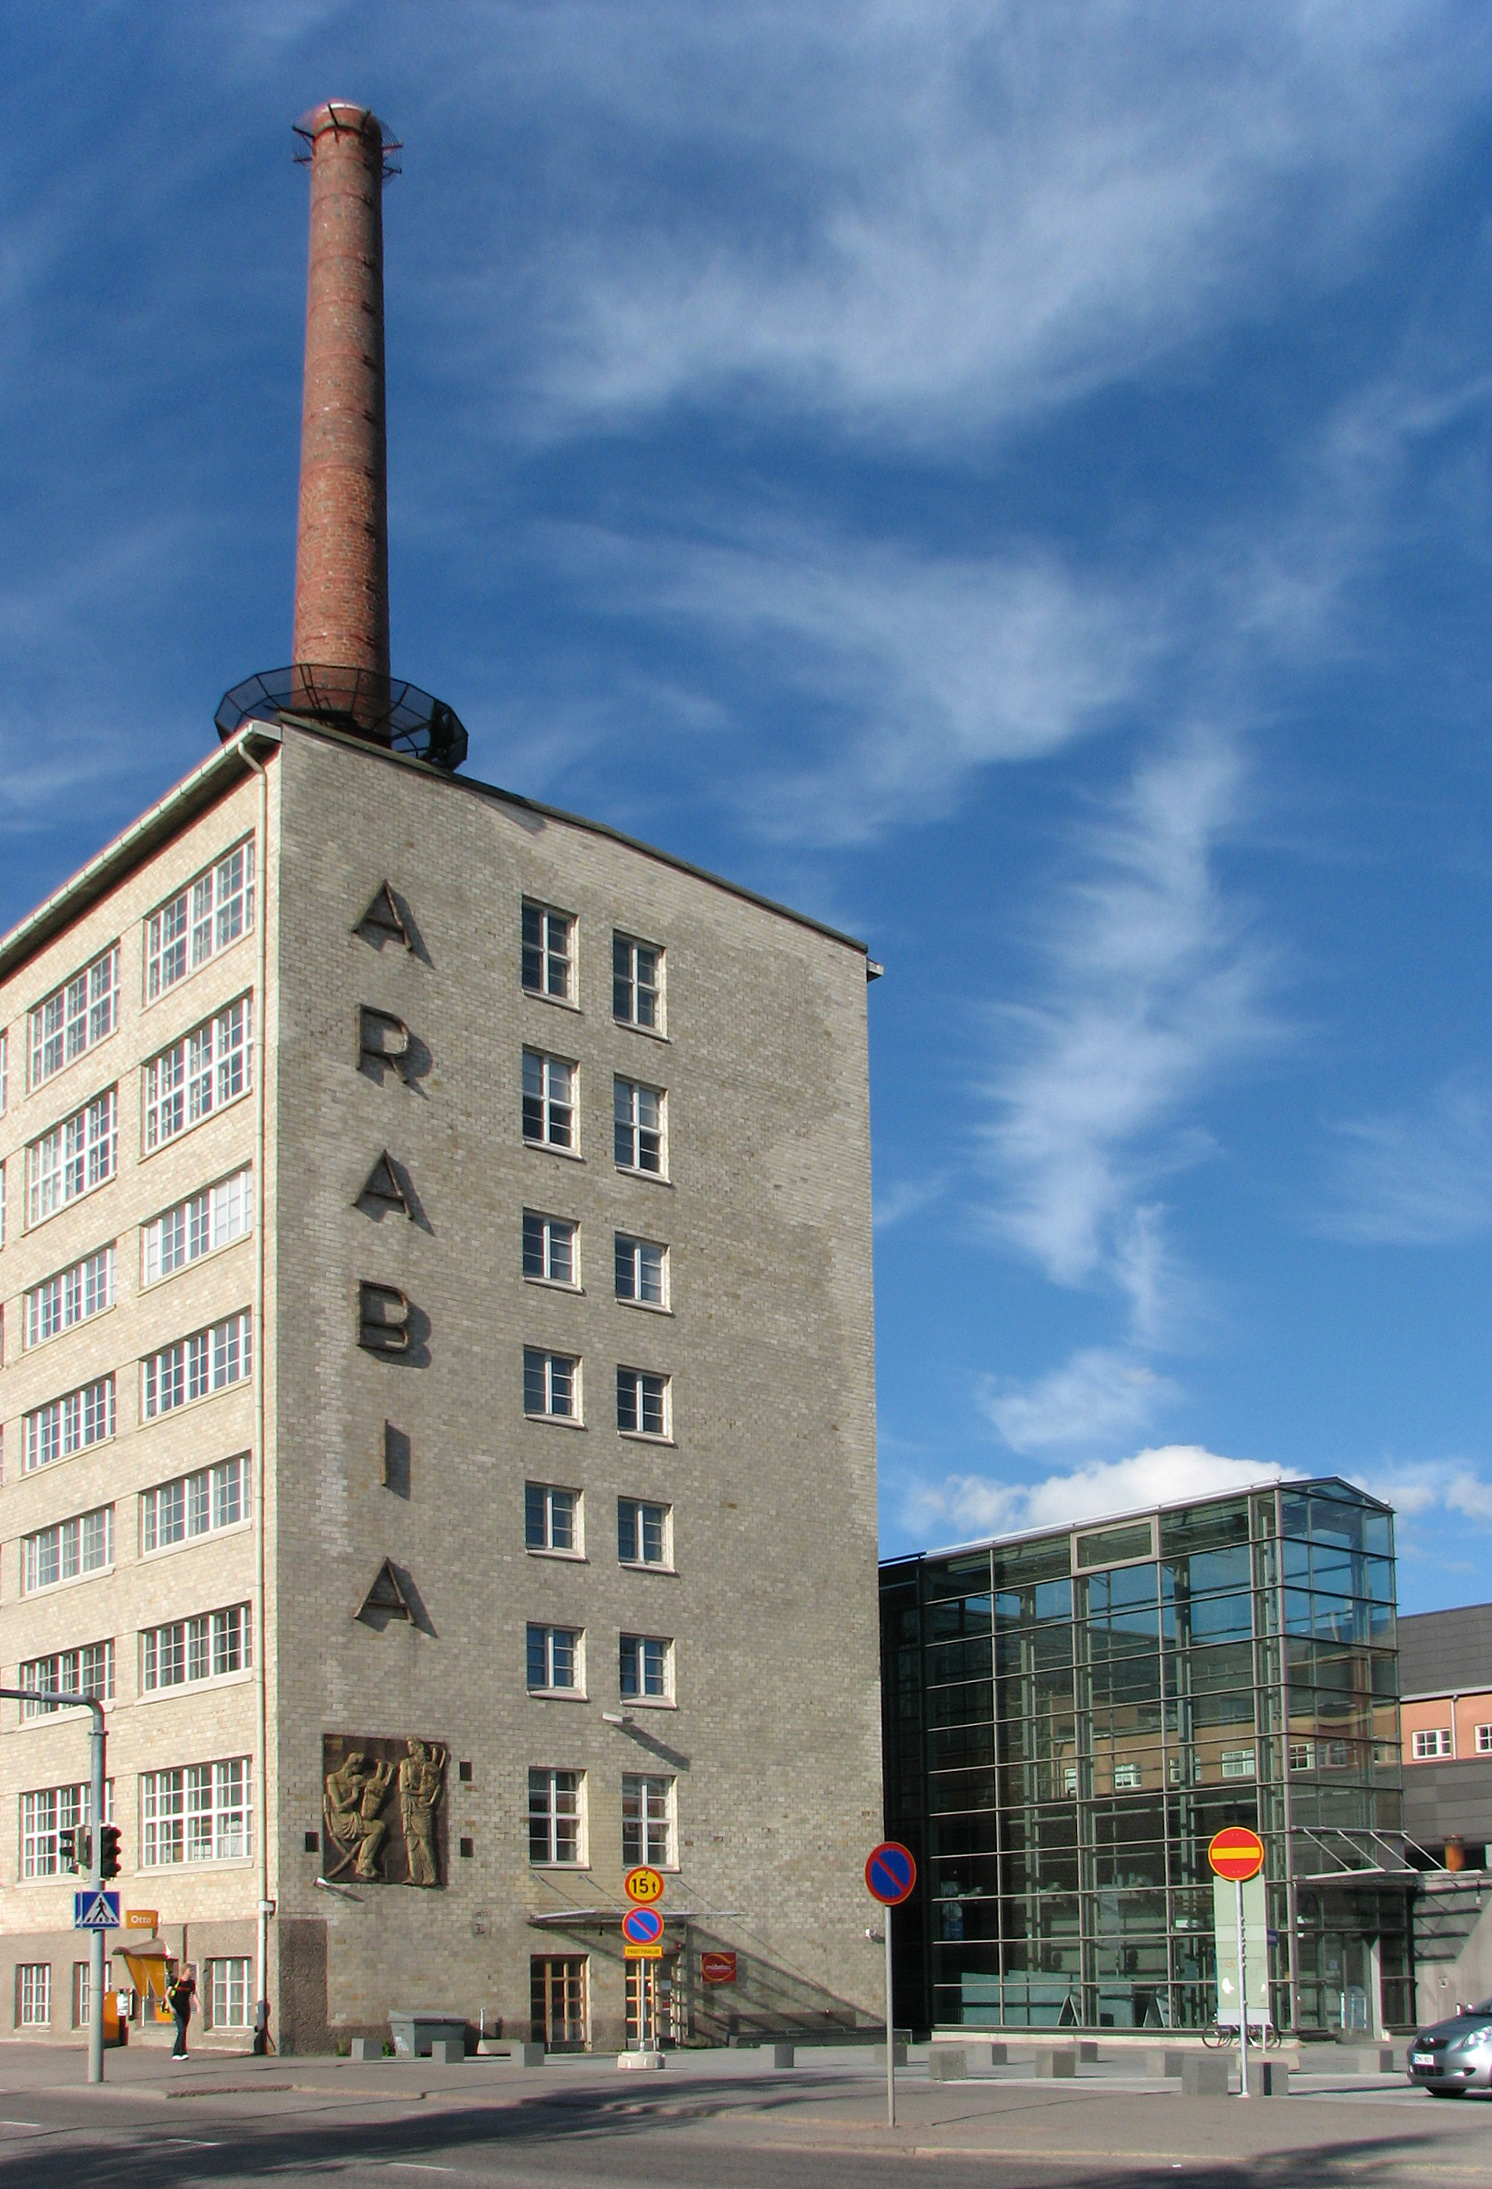 FileArabia Factory Buildingjpg Wikimedia Commons